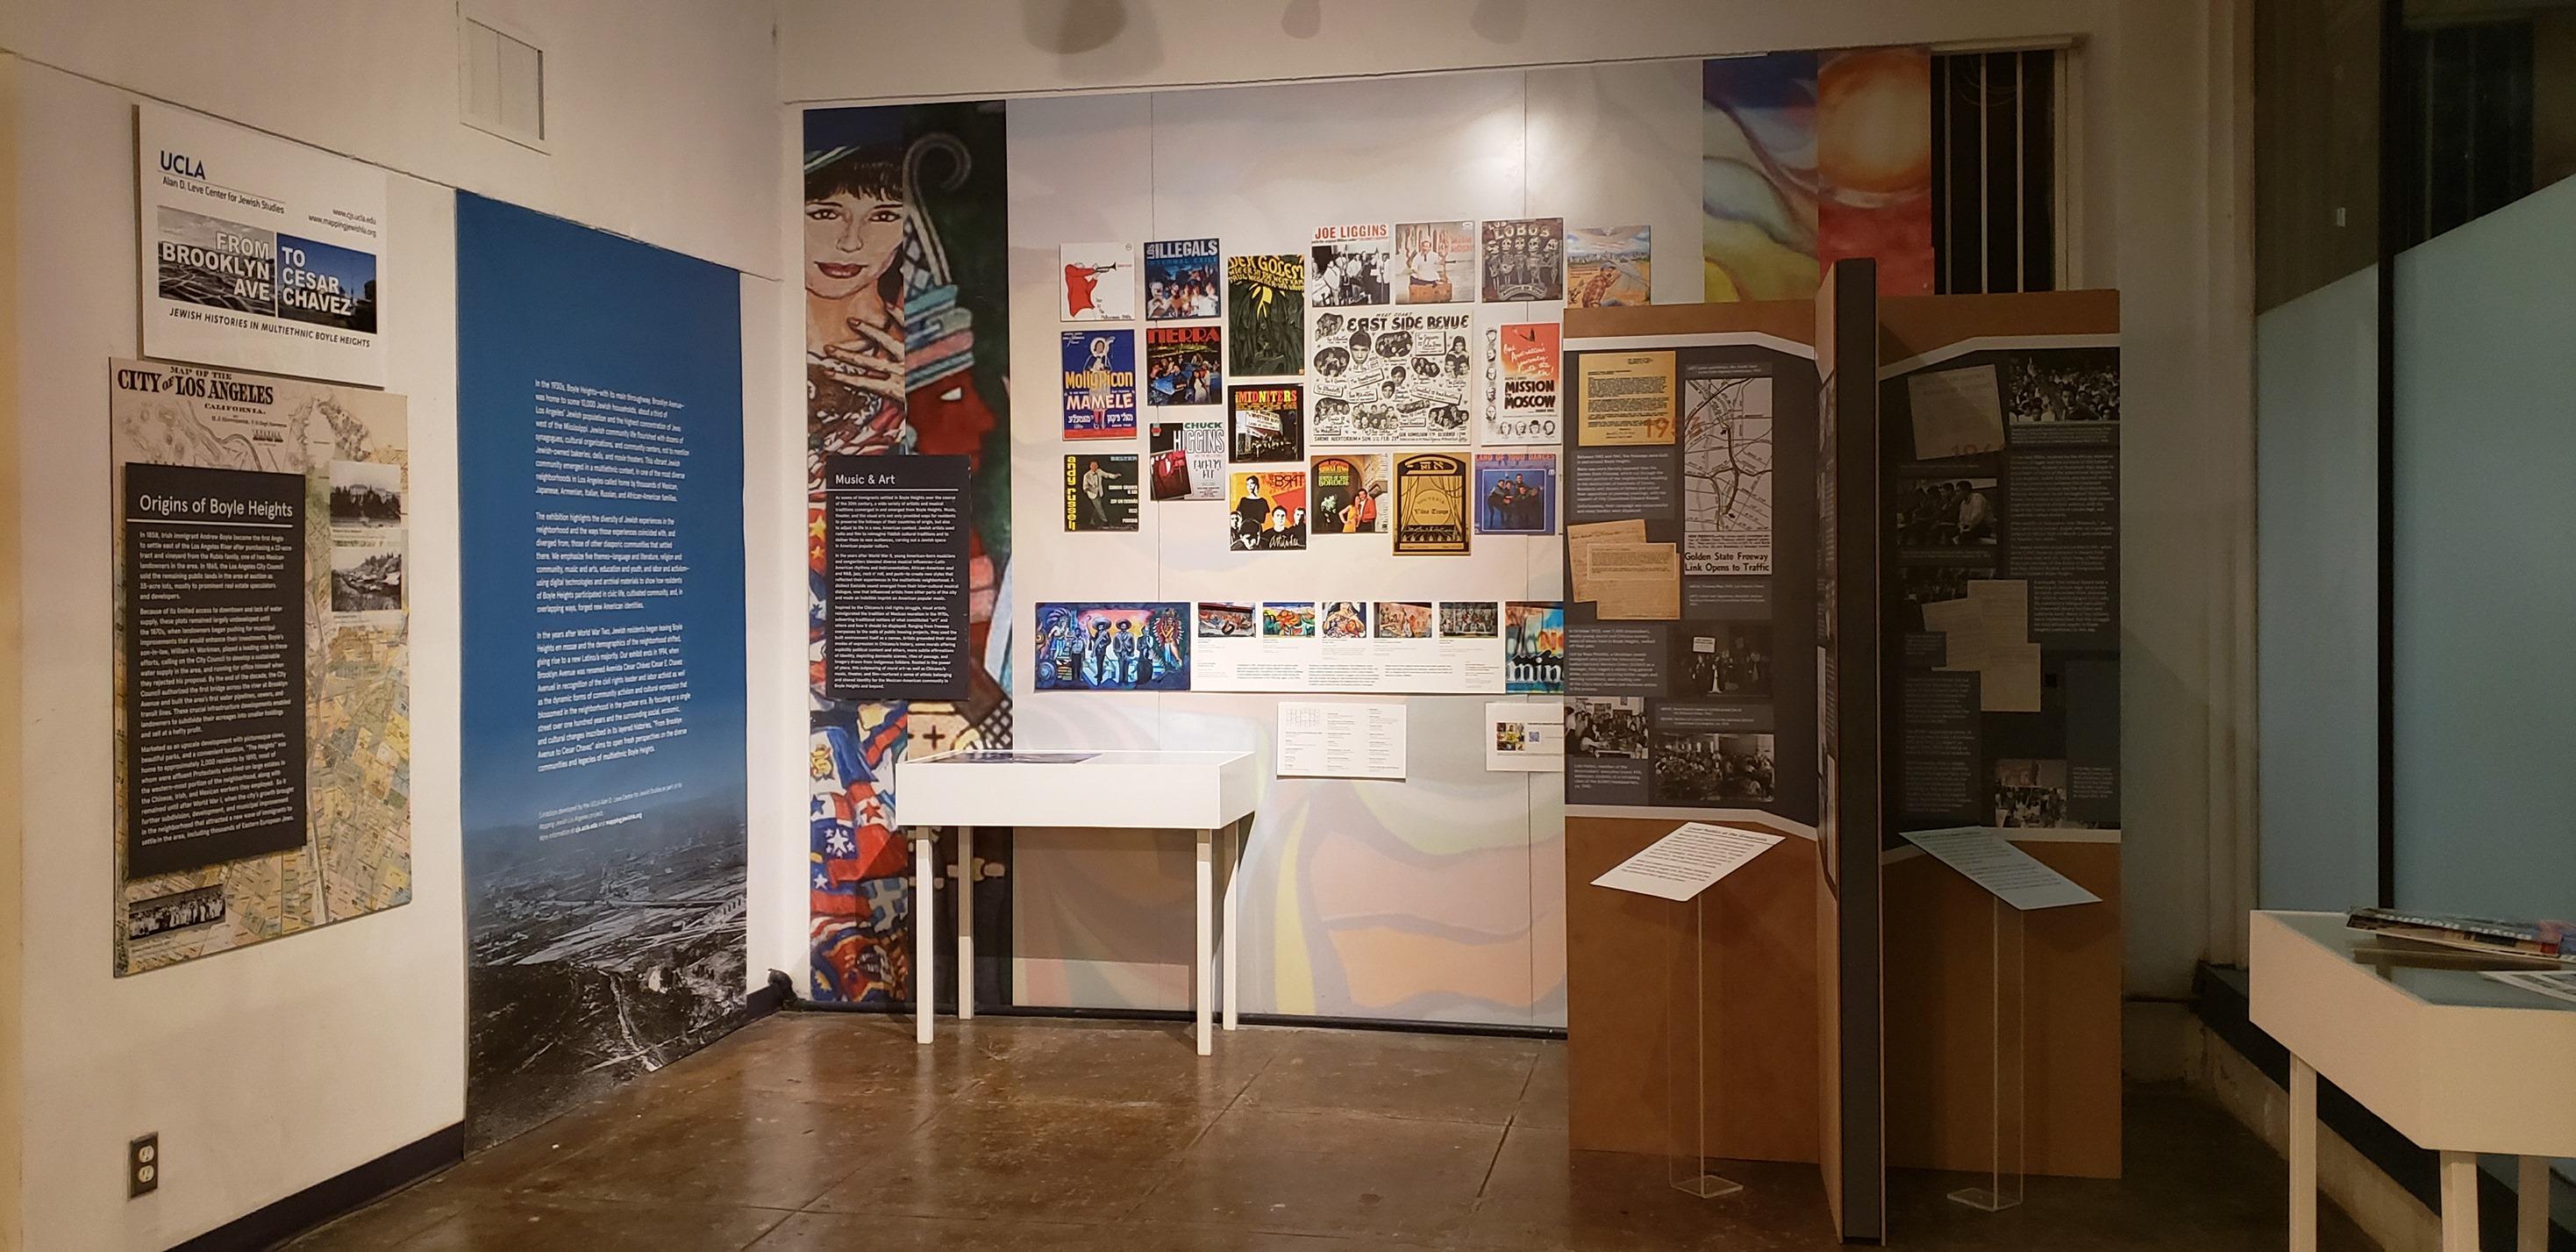 BoyleHeightsHistoryStudios-Museum